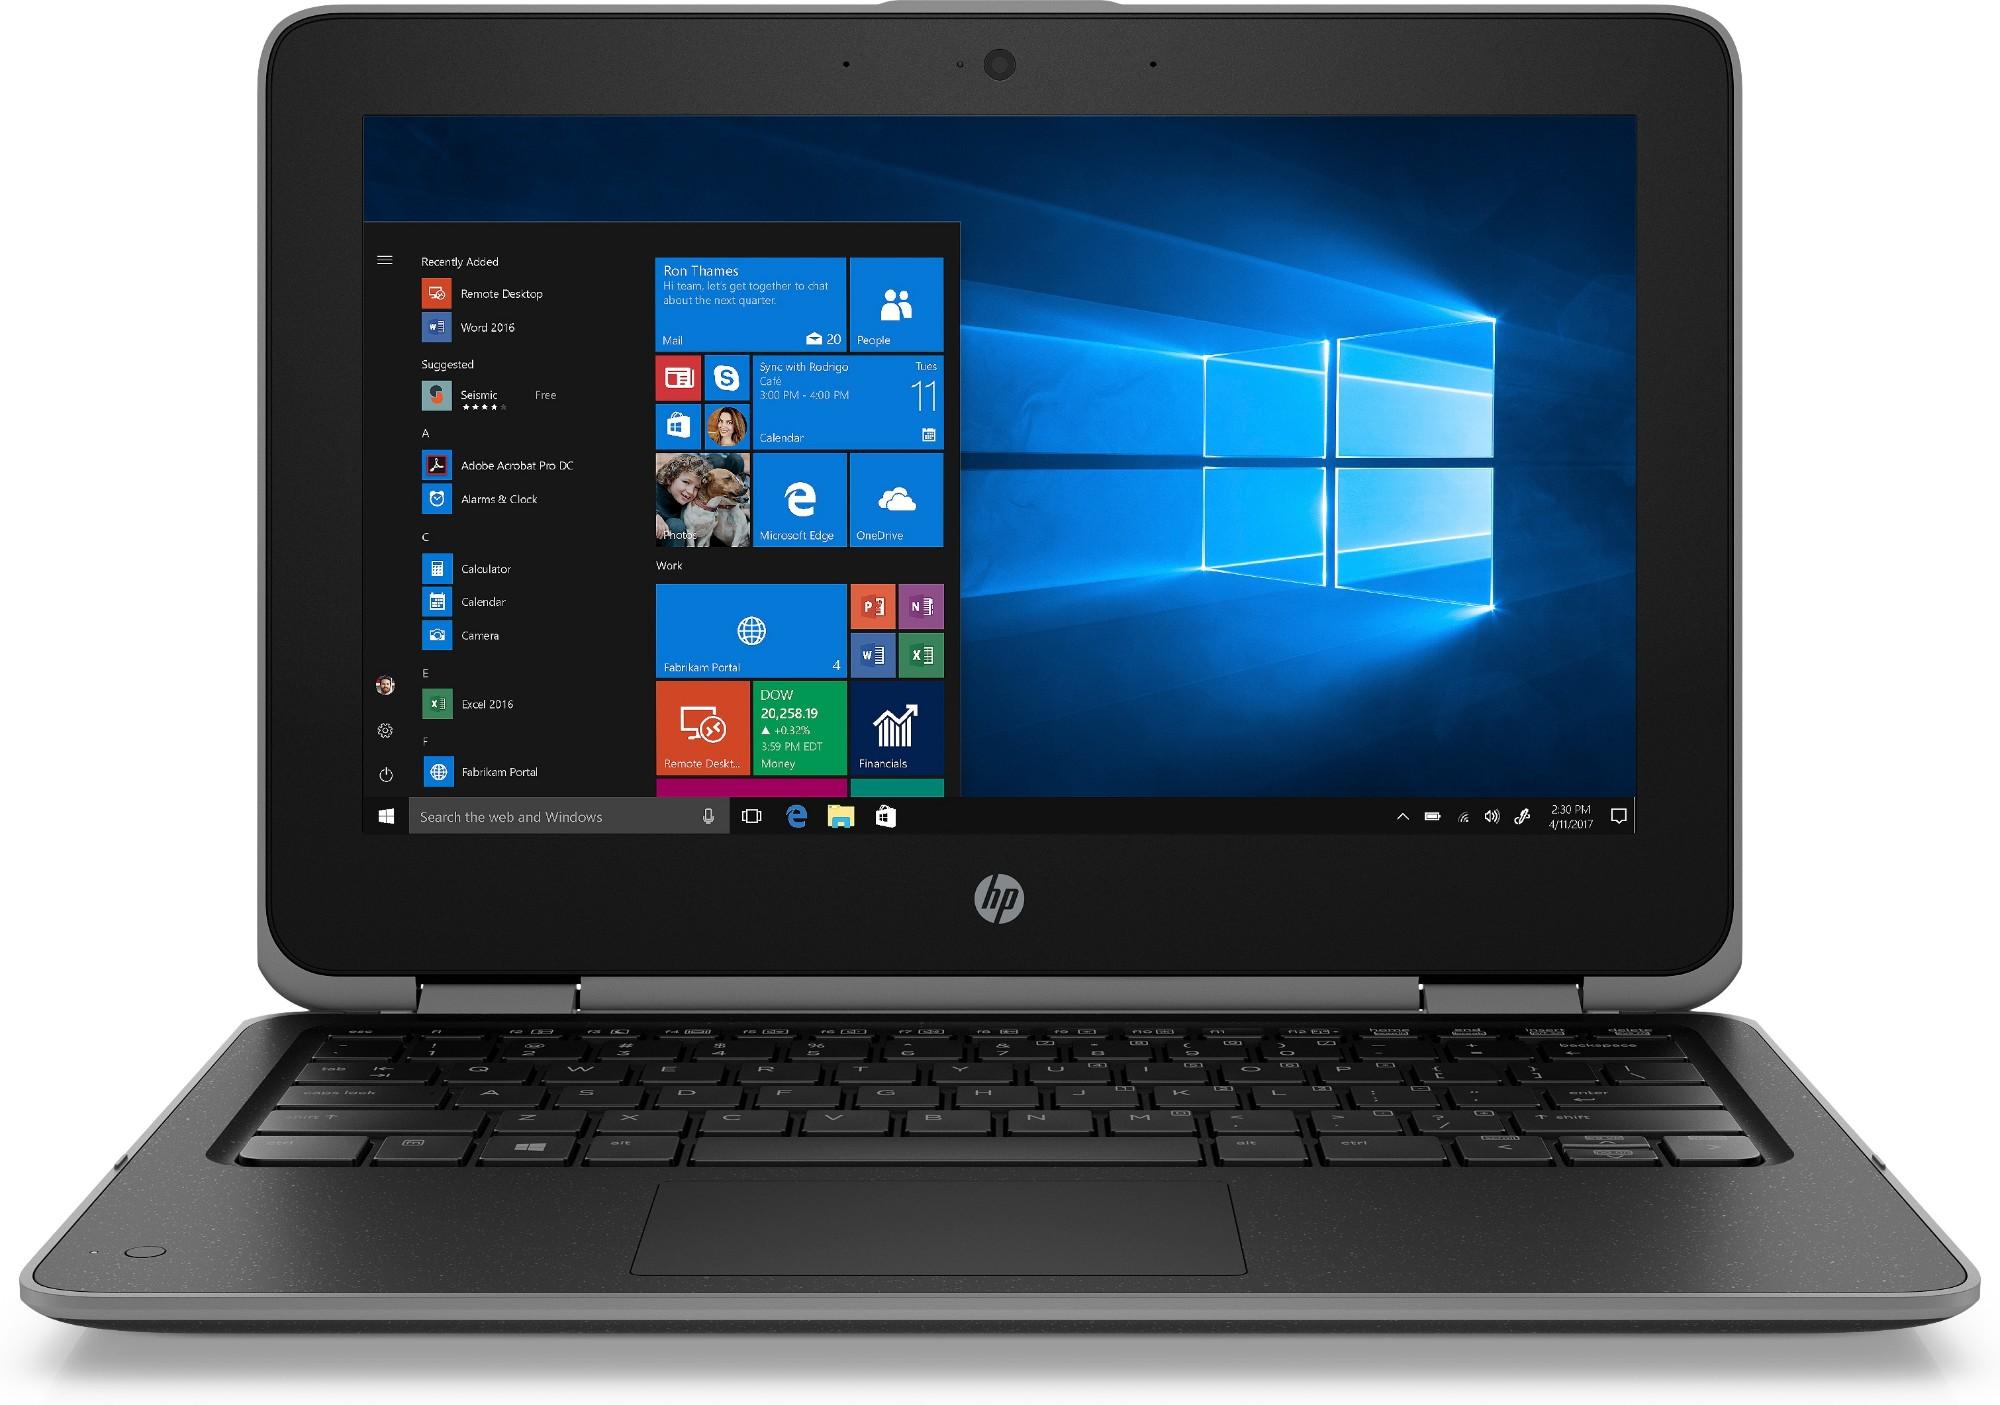 HP ProBook x360 11 G3 EE Hybrid (2-in-1) Black 29.5 cm (11.6